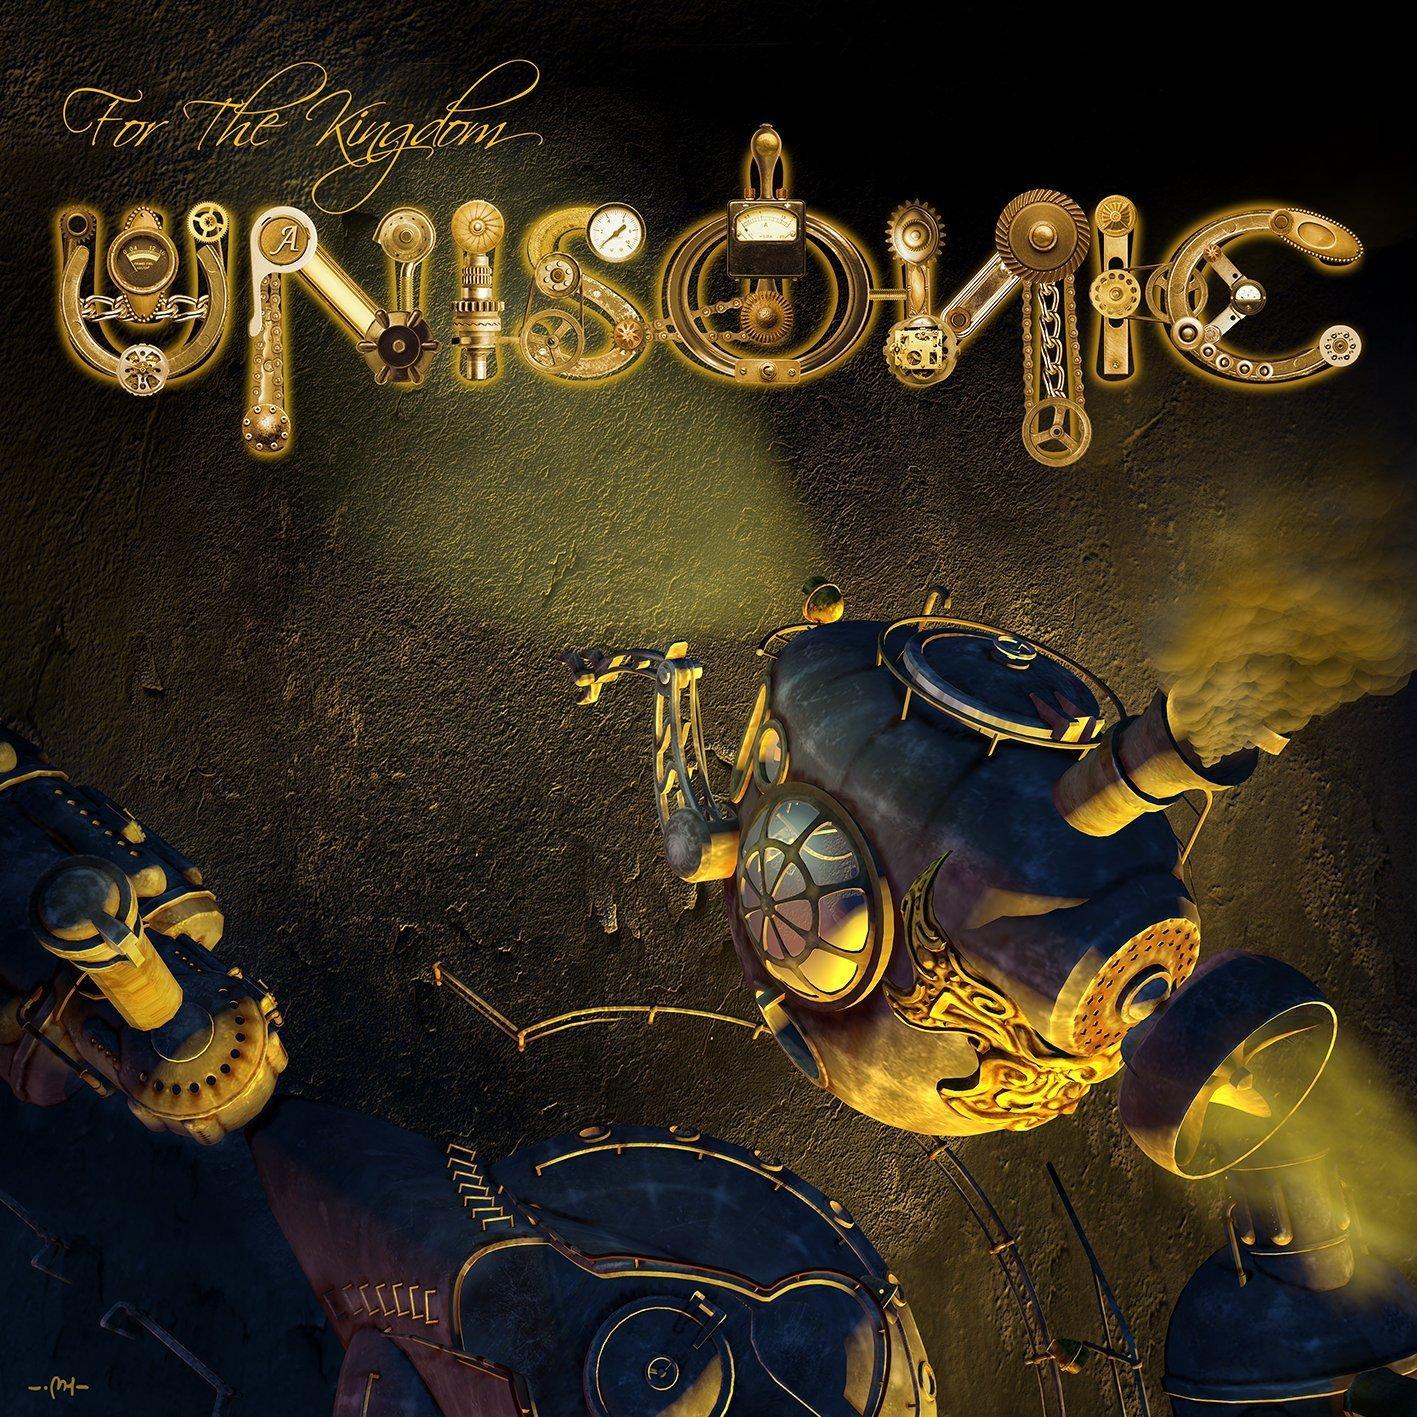 Unisonic — For the Kingdom EP (2014)